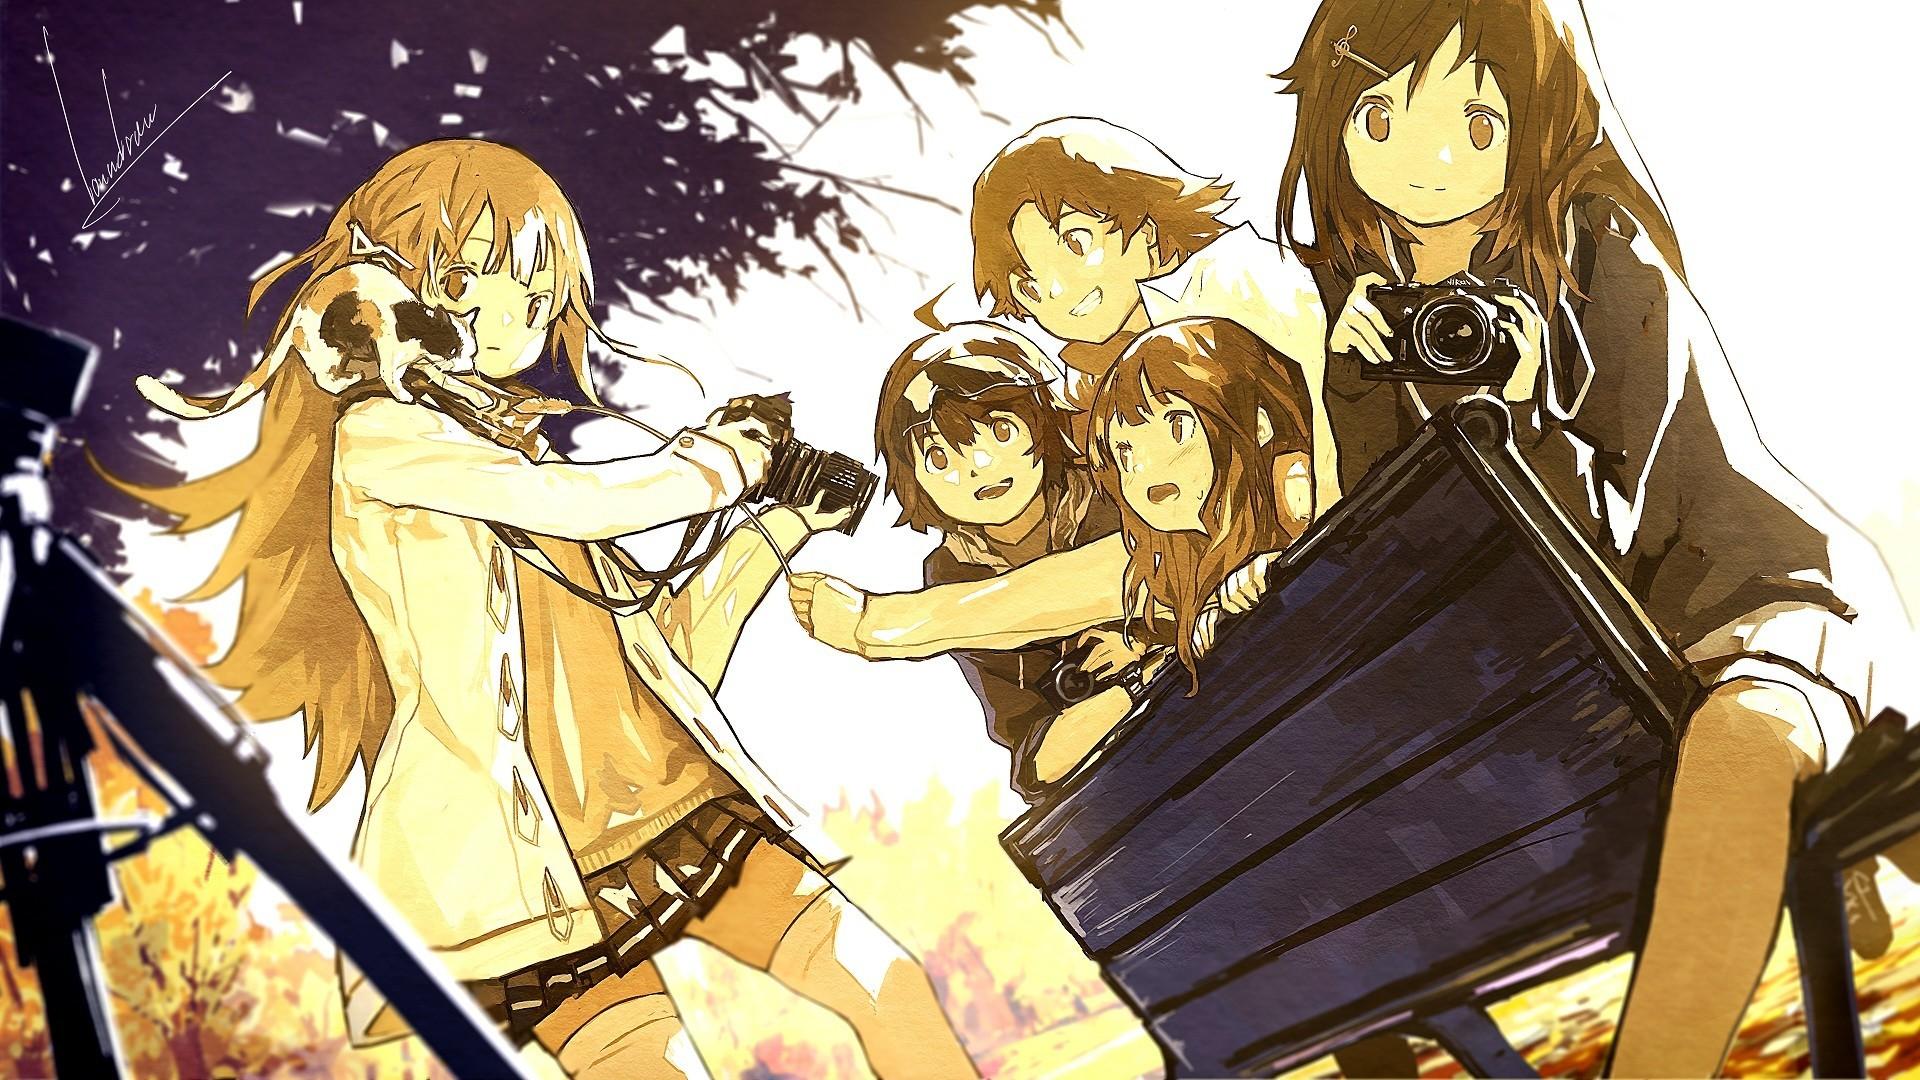 Anime 1920x1080 manga anime cats camera long hair sepia bench loundraw DeviantArt group of women